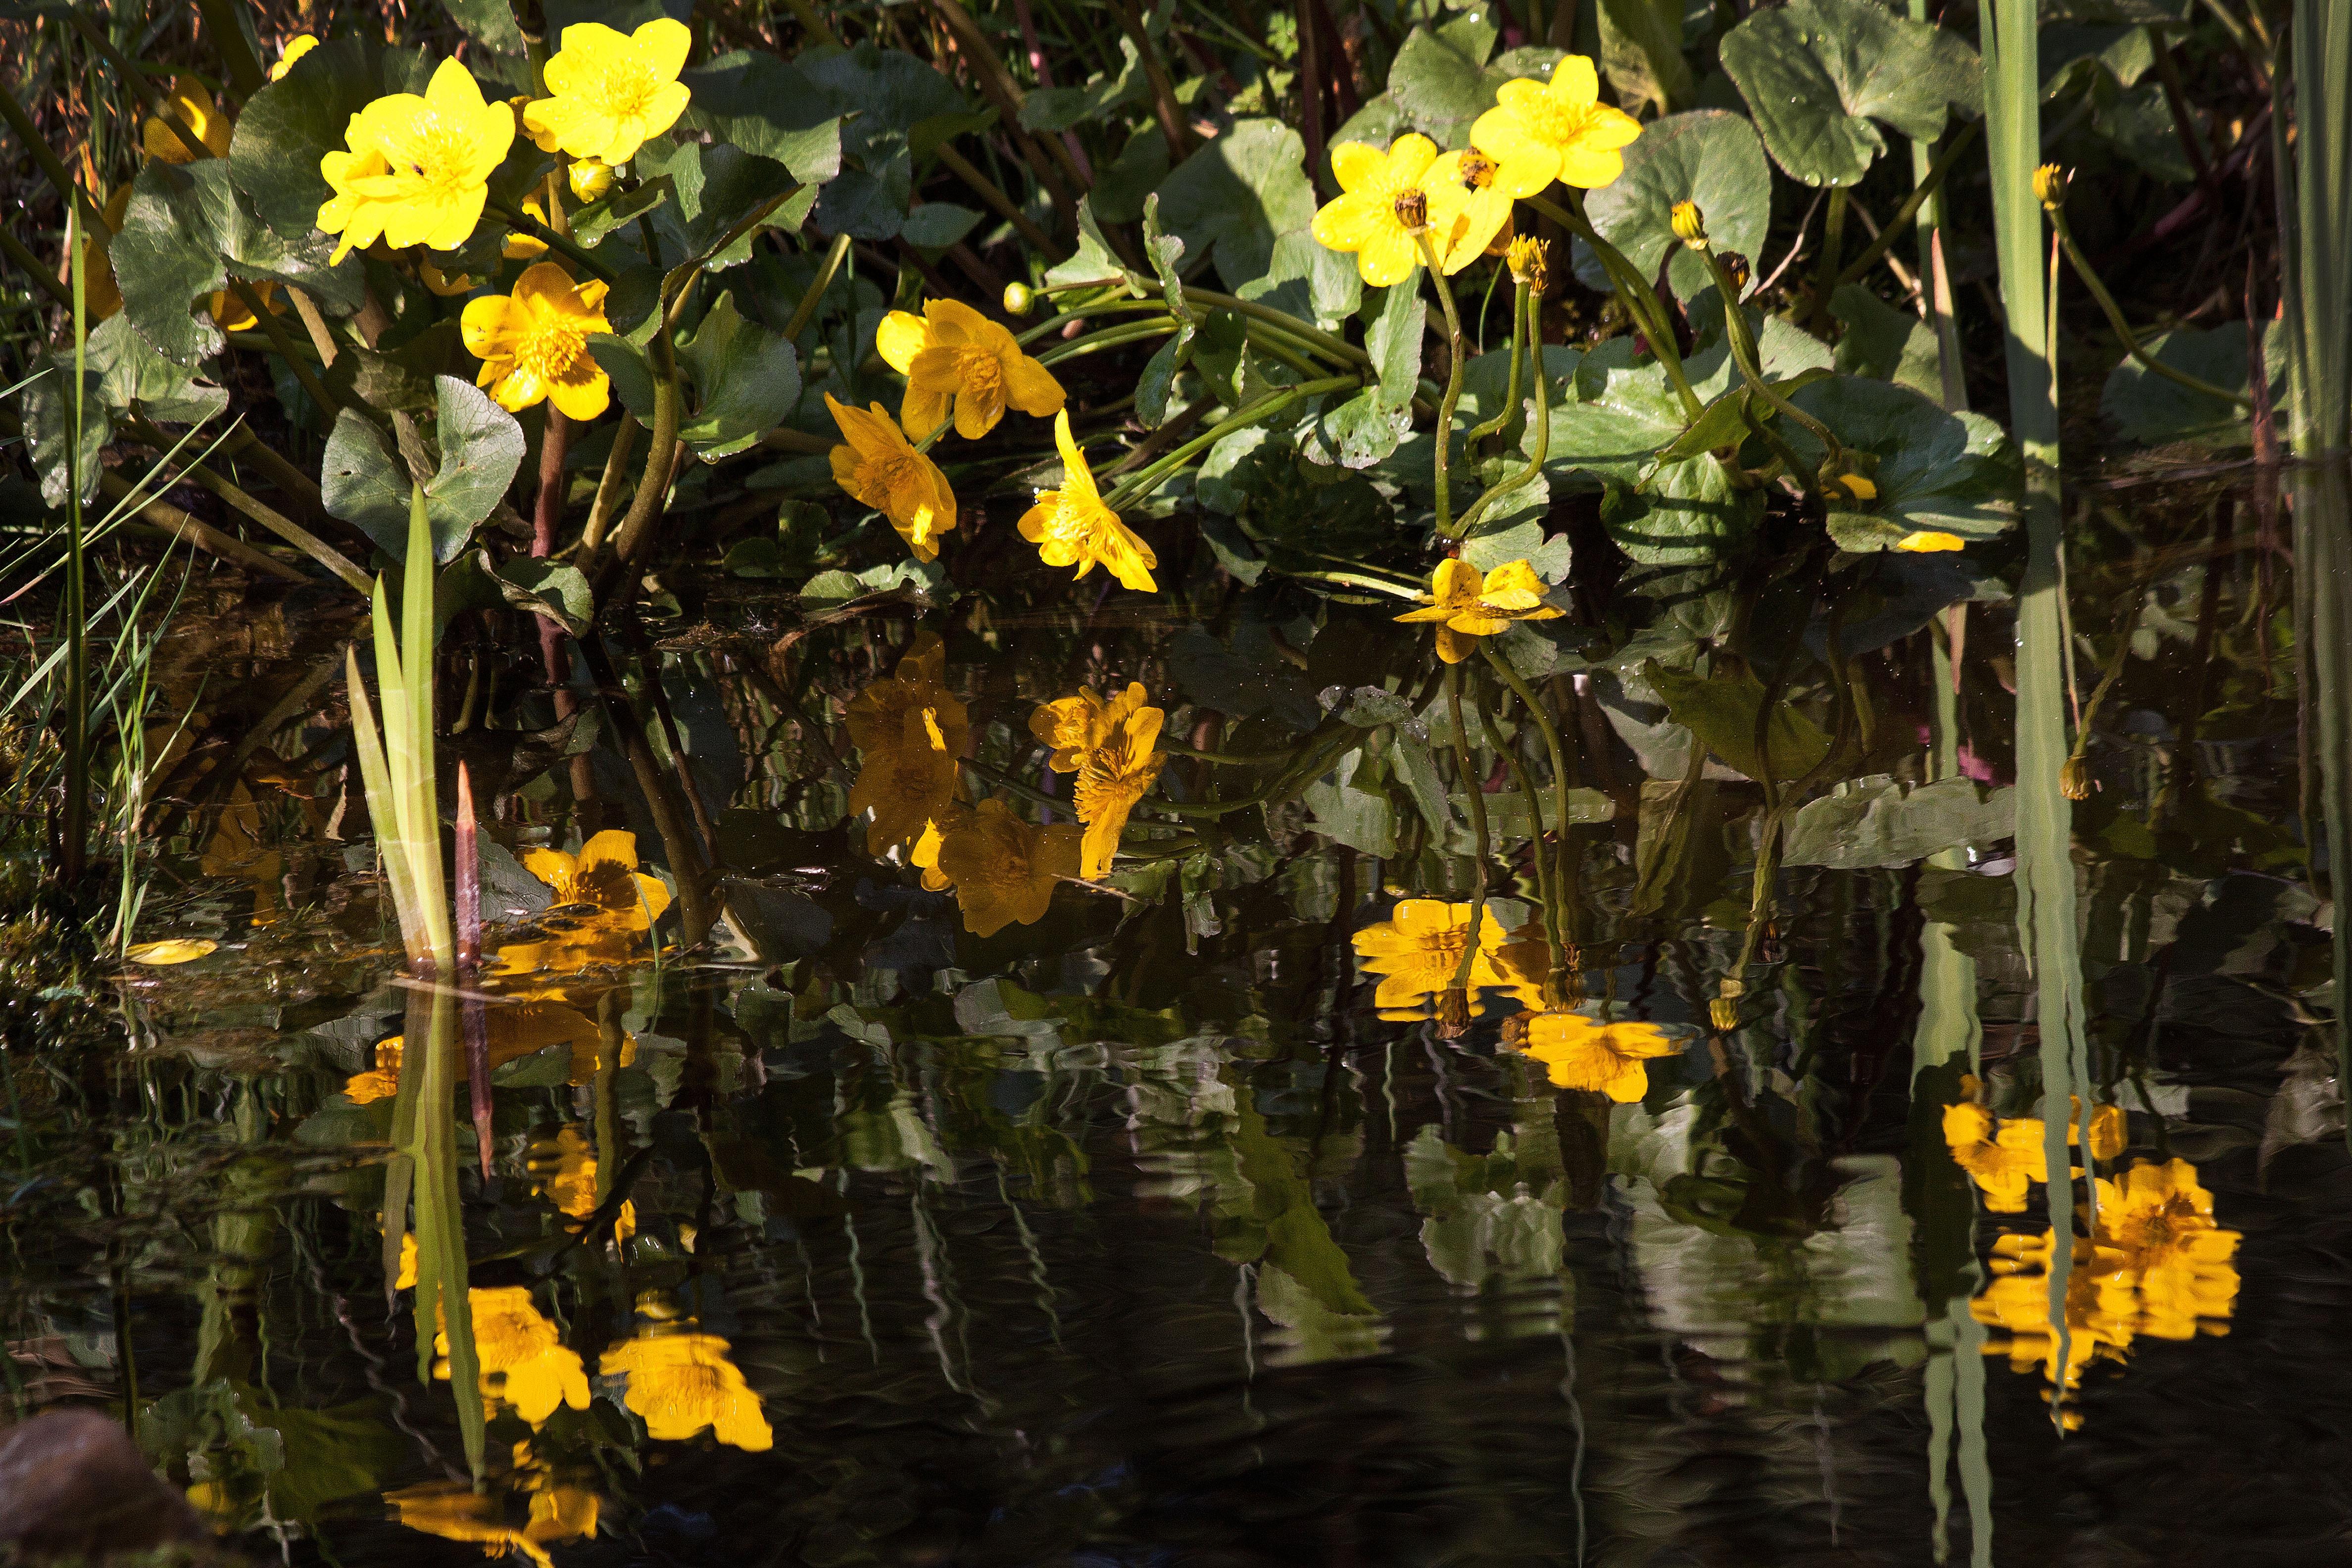 желтые цветы на пруду фото